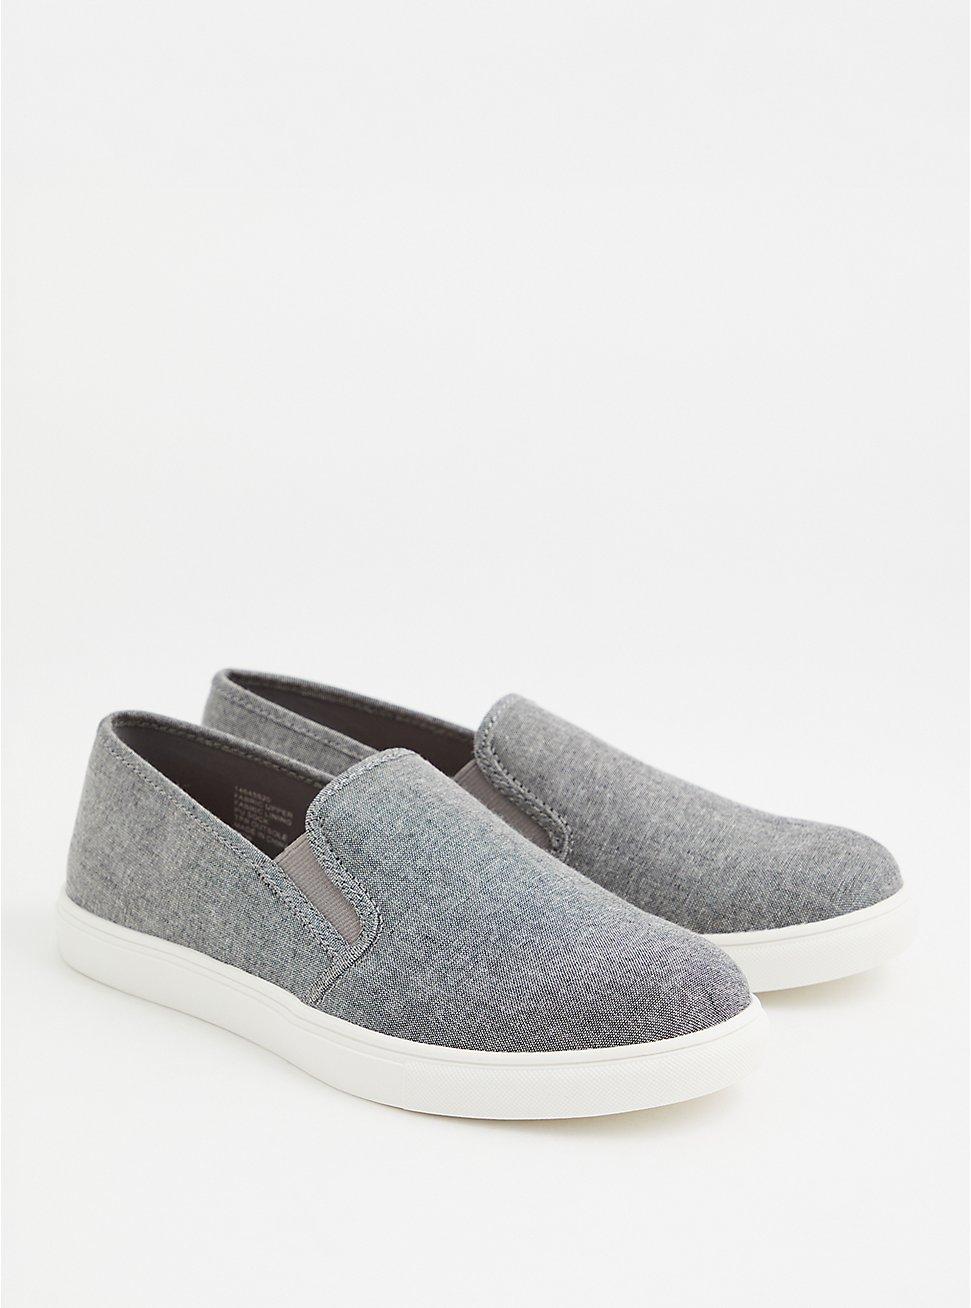 Charcoal Grey Canvas Slip-On Sneaker (WW), GREY, hi-res